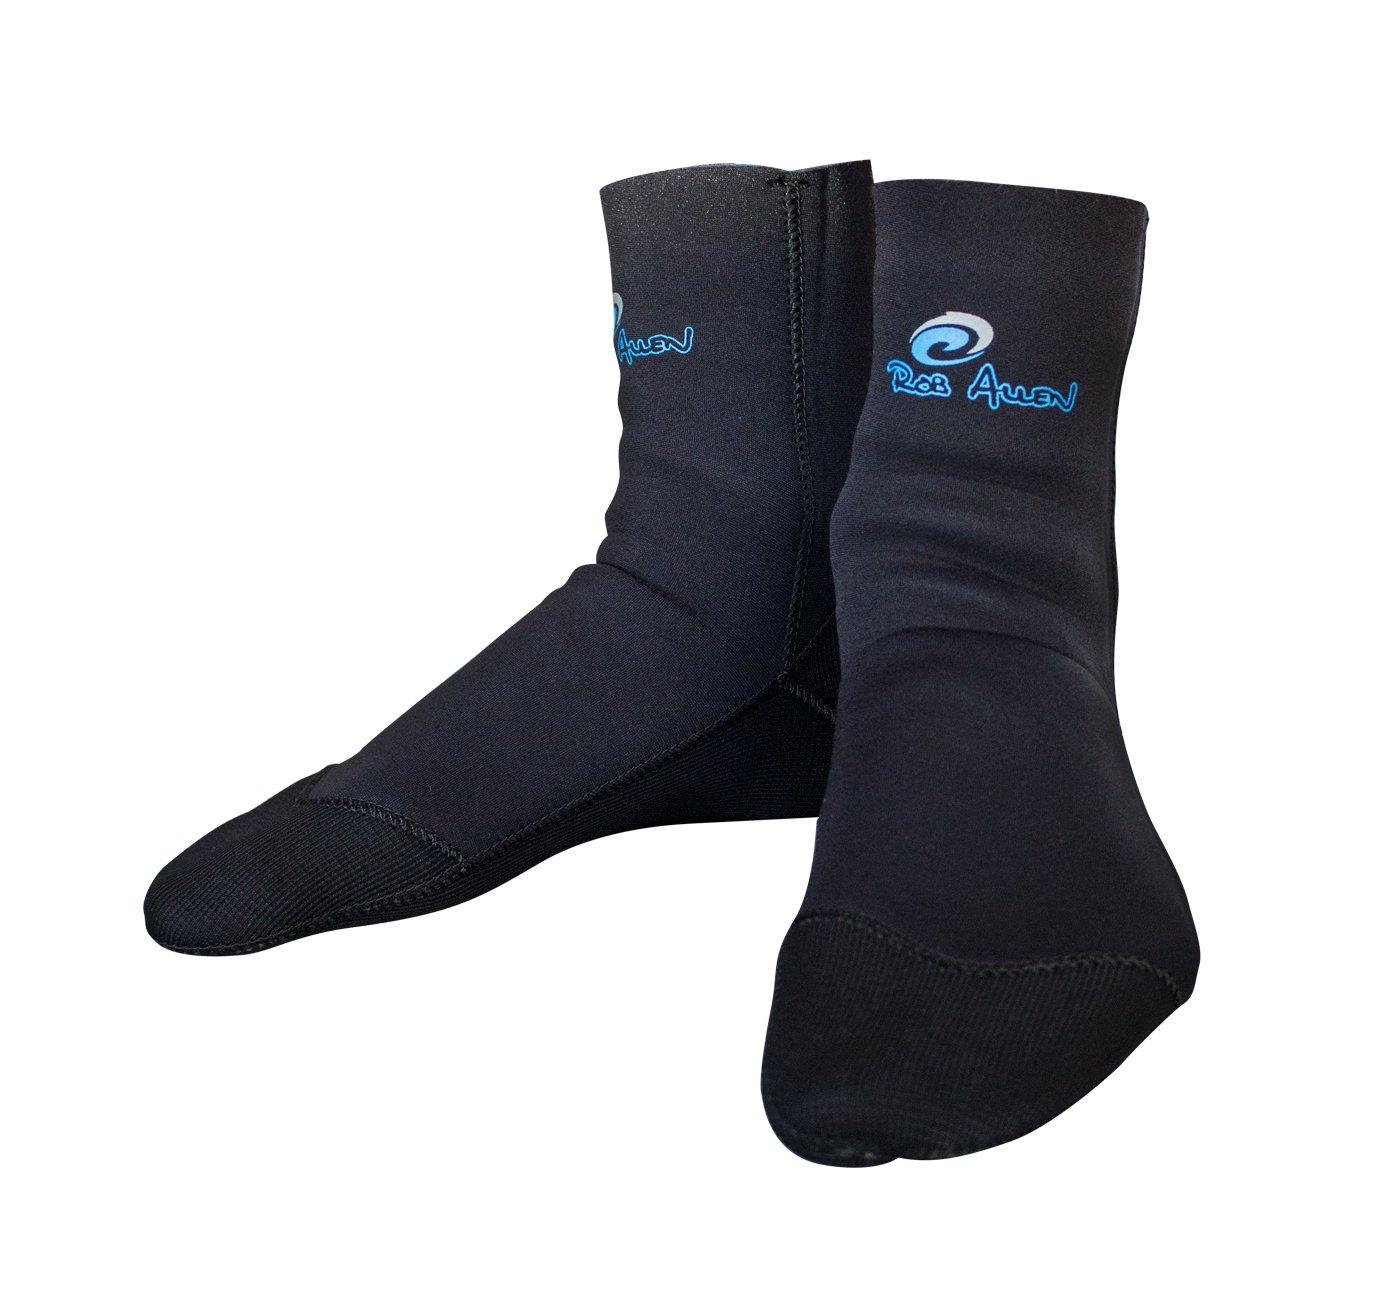 Rob Allen Fin Socks 3mm